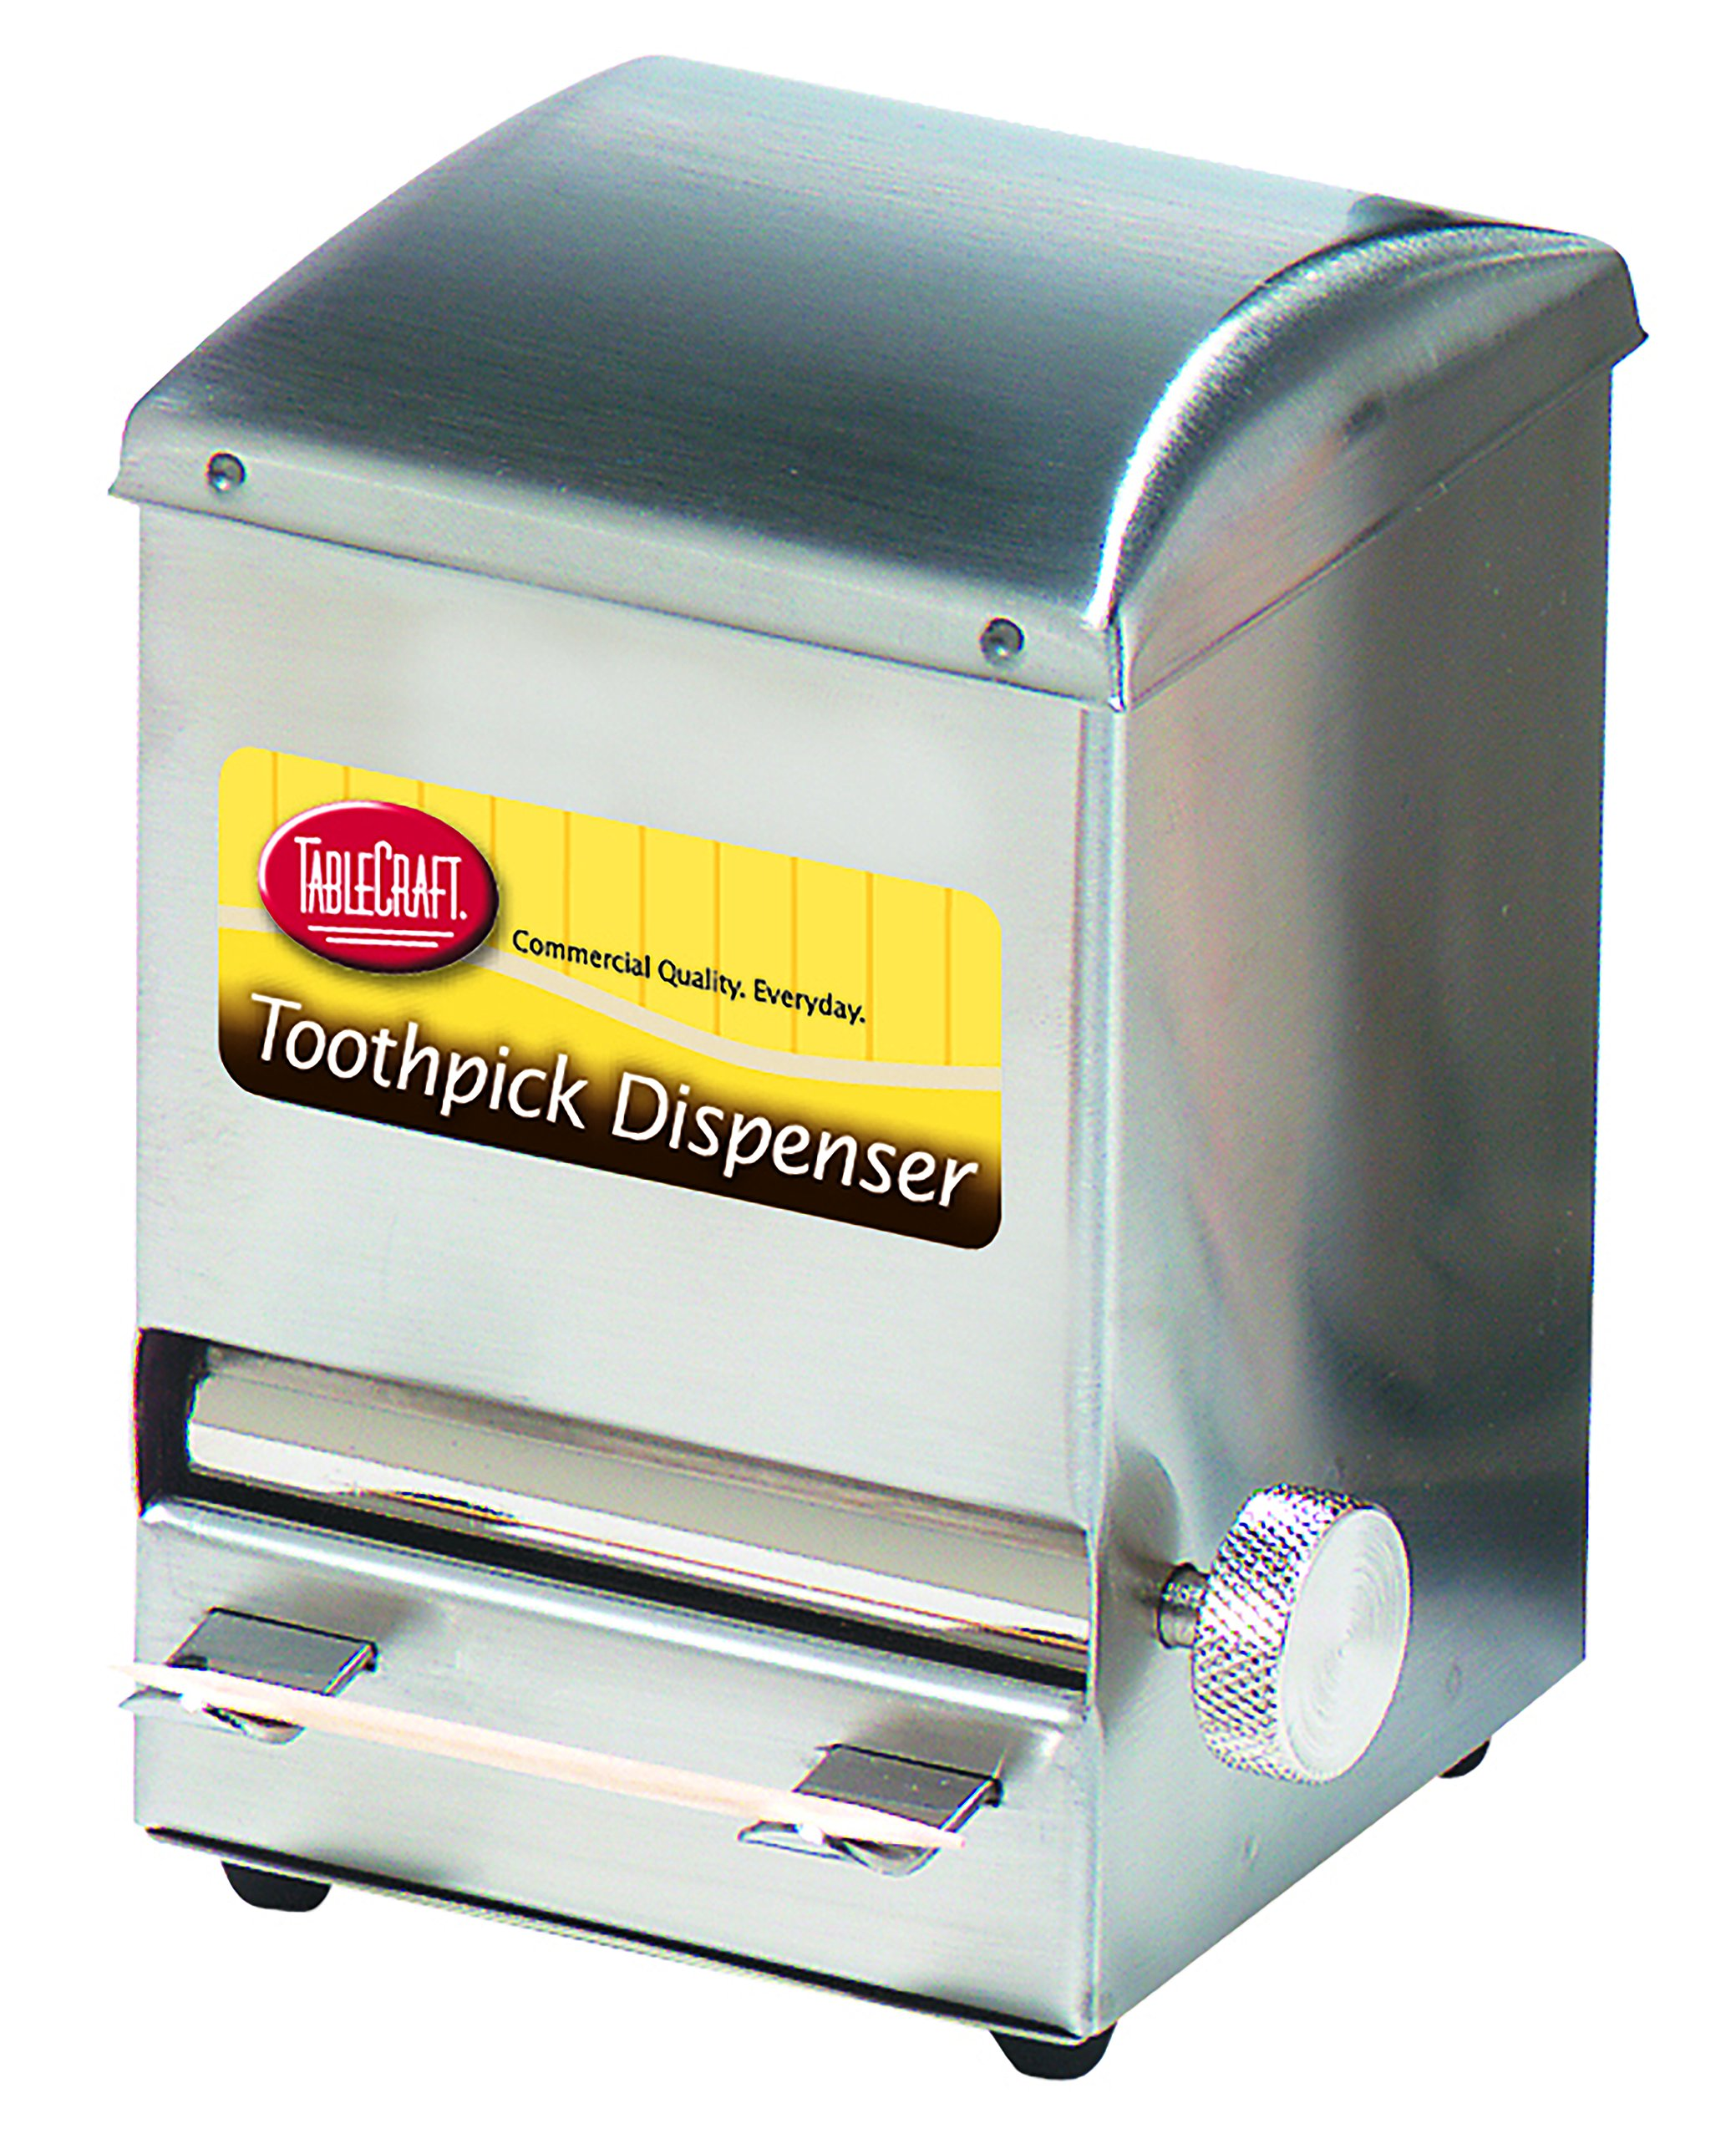 Tablecraft H236 Toothpick Dispenser, NULL by Tablecraft